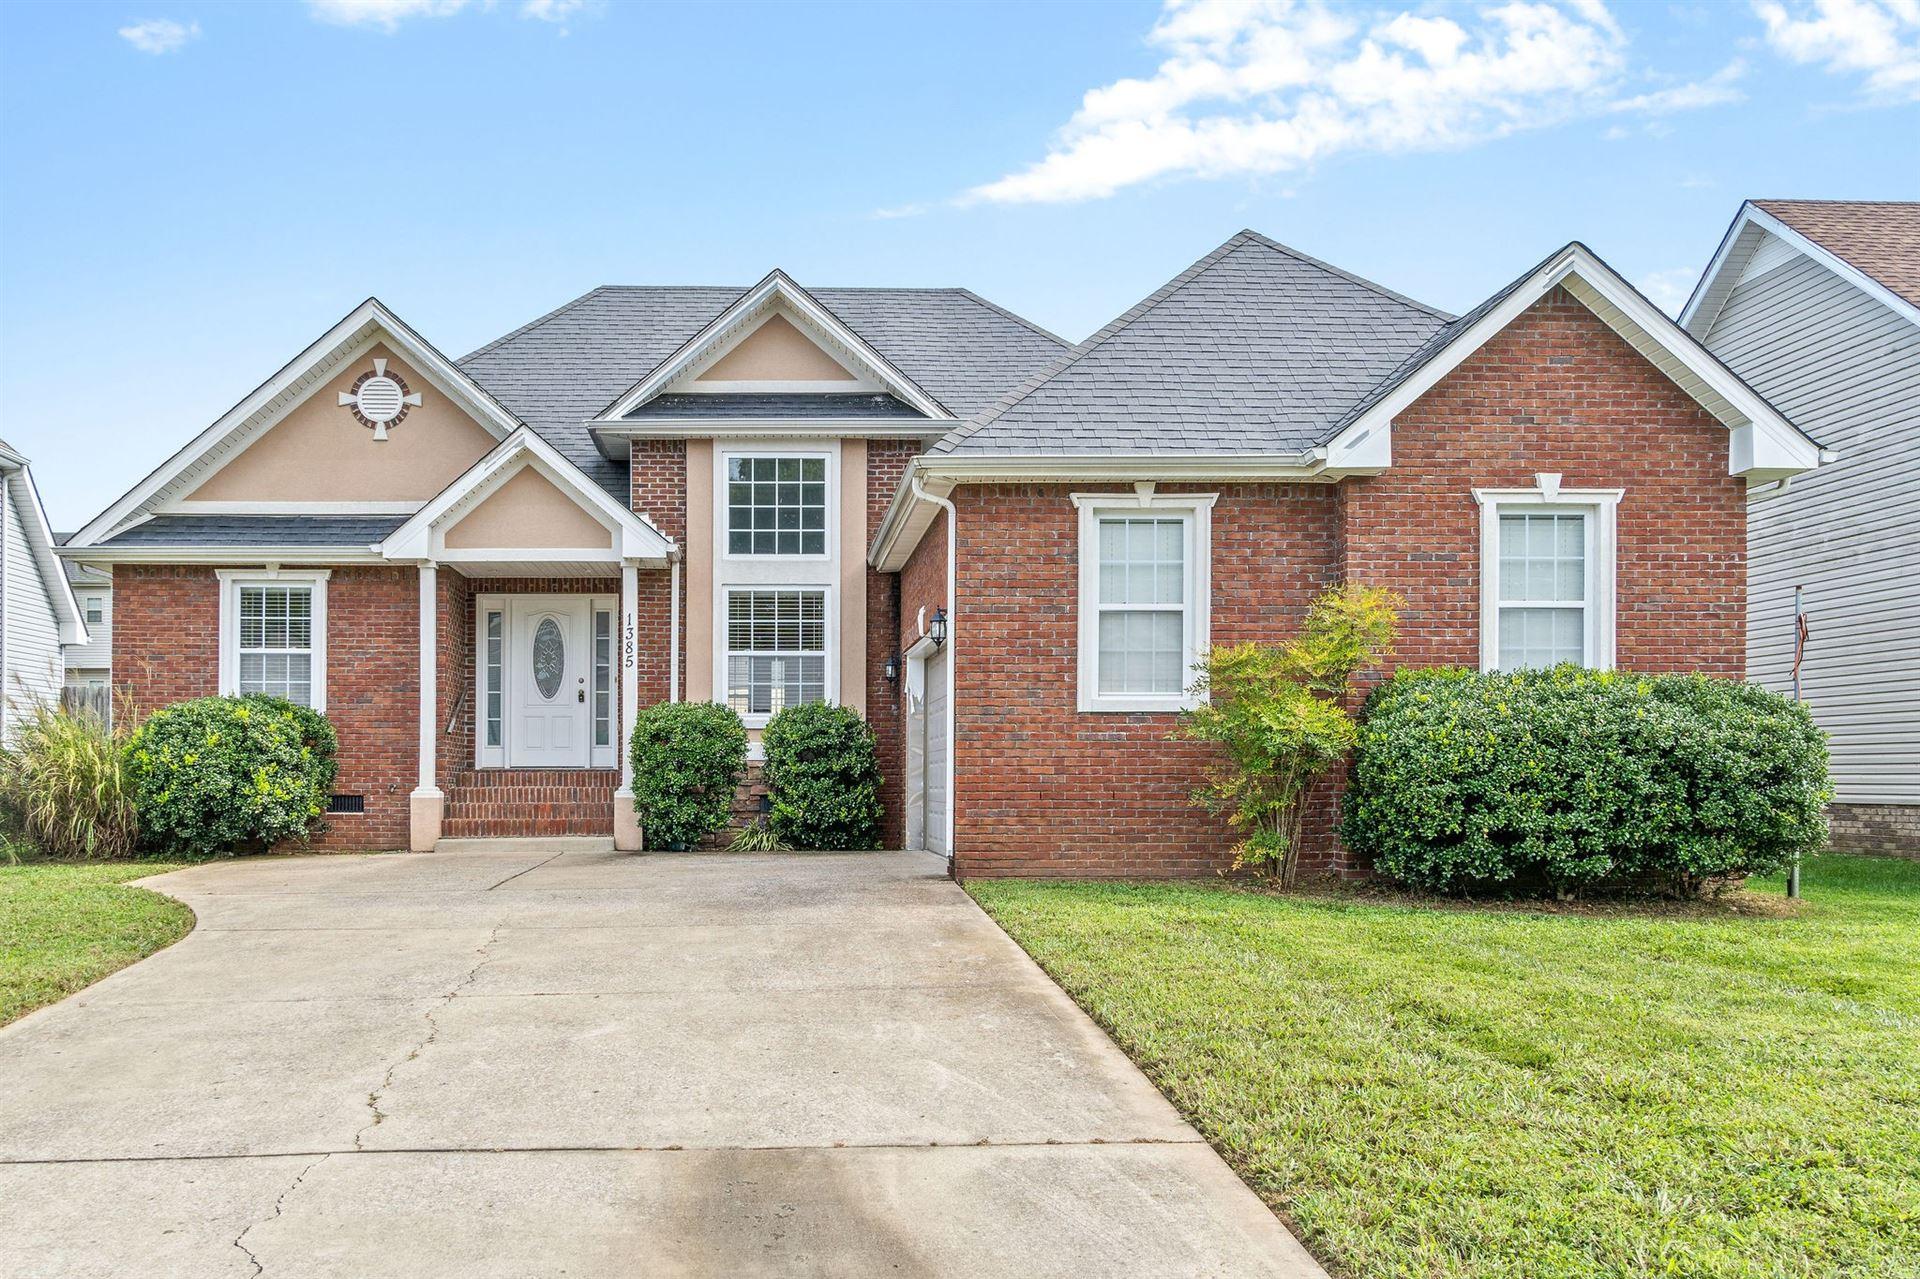 1385 Bruceton Dr, Clarksville, TN 37042 - MLS#: 2291257